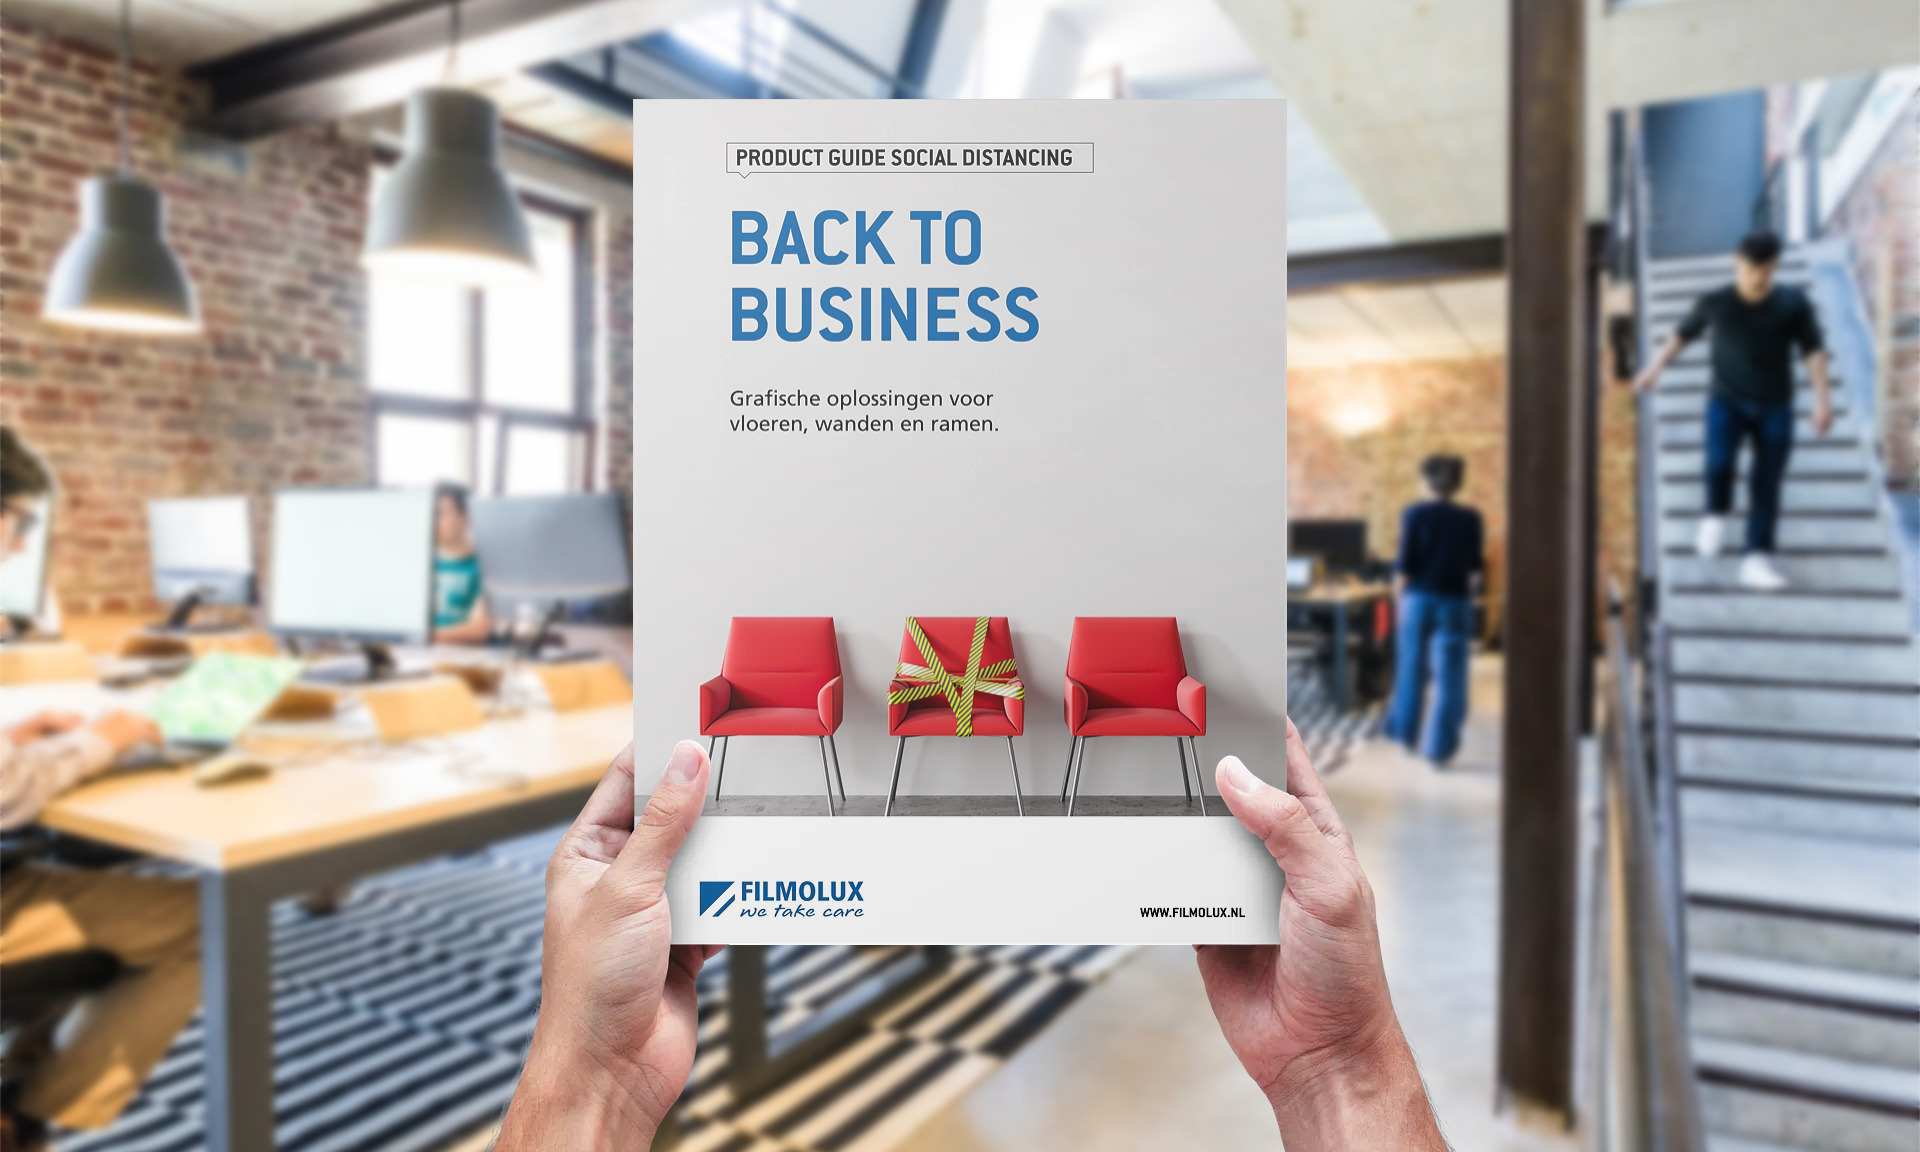 back to business_cta high res_filmolux-1